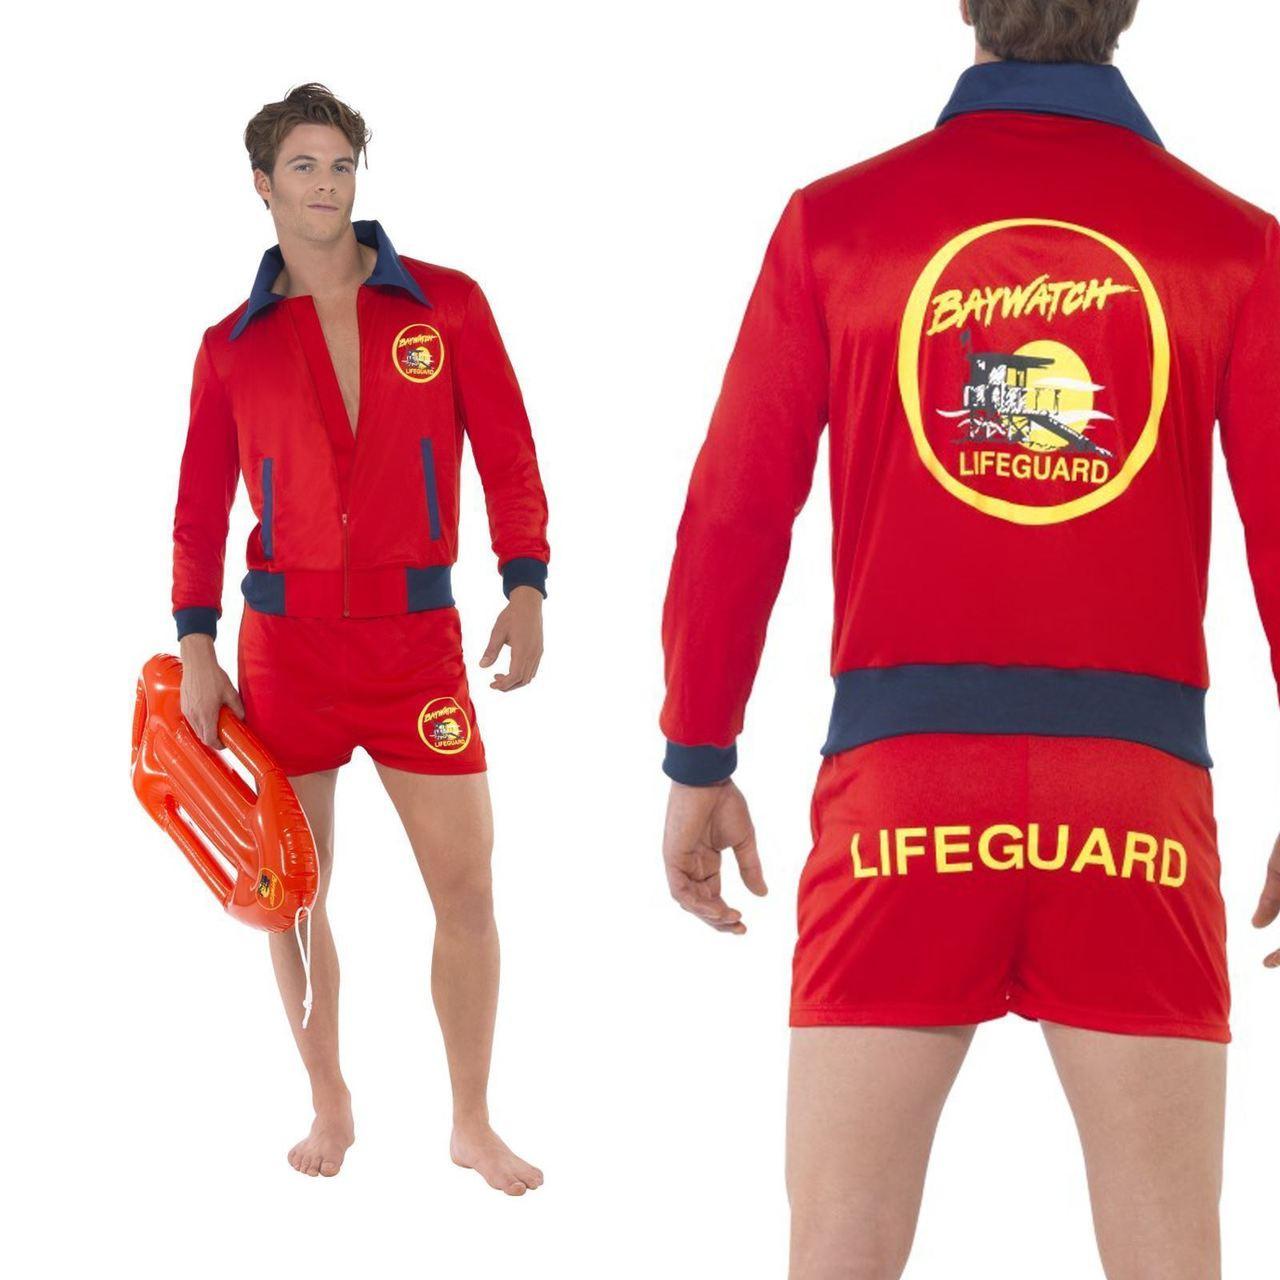 609016e66db1 Smiffys Baywatch Lifeguard Beach The Rock Adult Mens Halloween Costume  20587 - Fearless Apparel